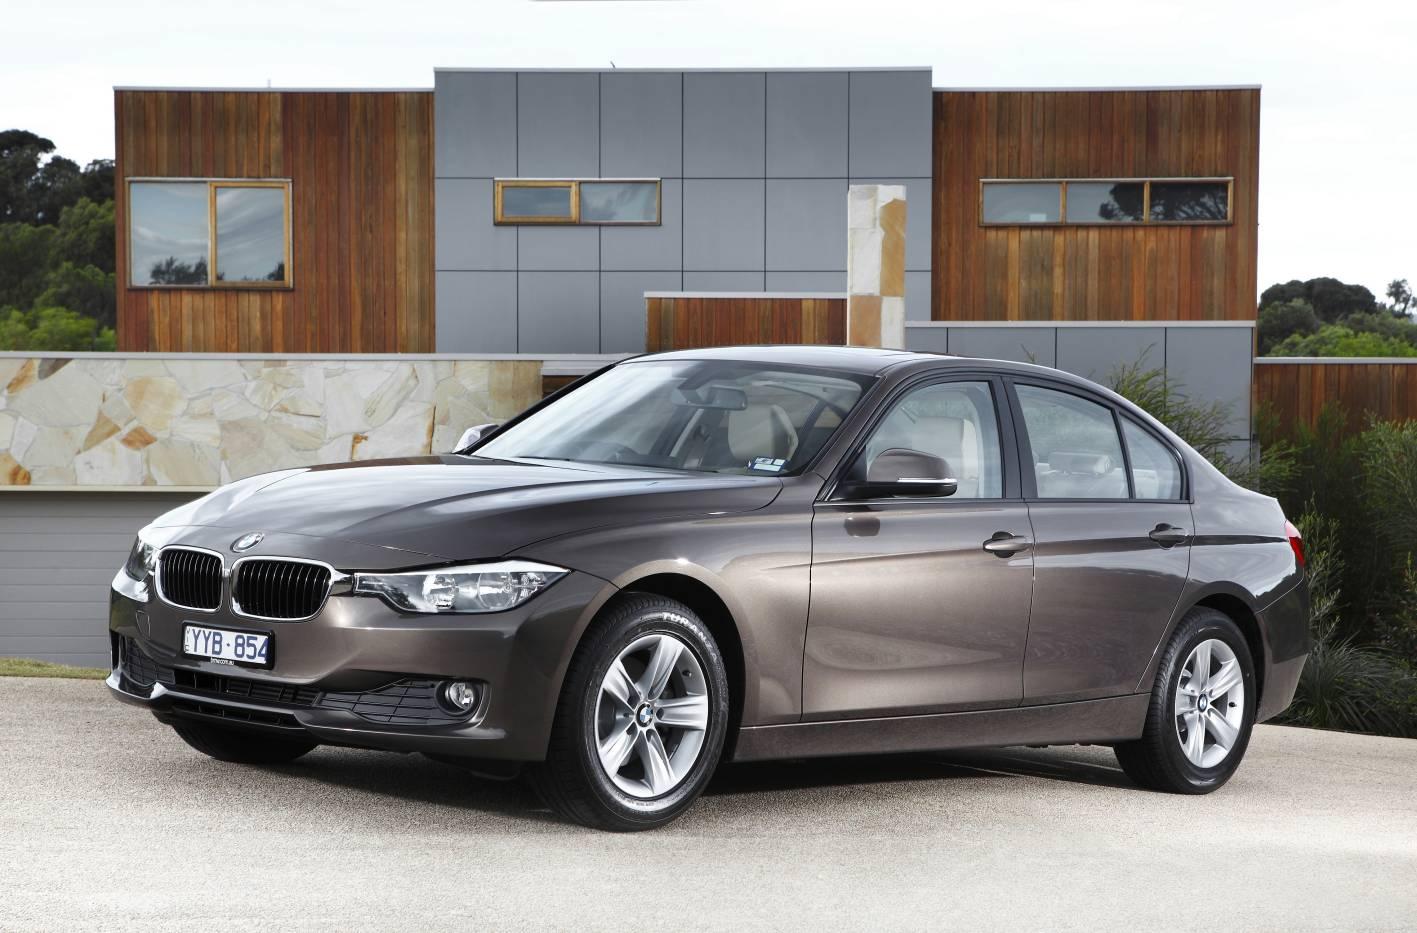 bmw cars news bmw adds 316i sedan to lineup. Black Bedroom Furniture Sets. Home Design Ideas